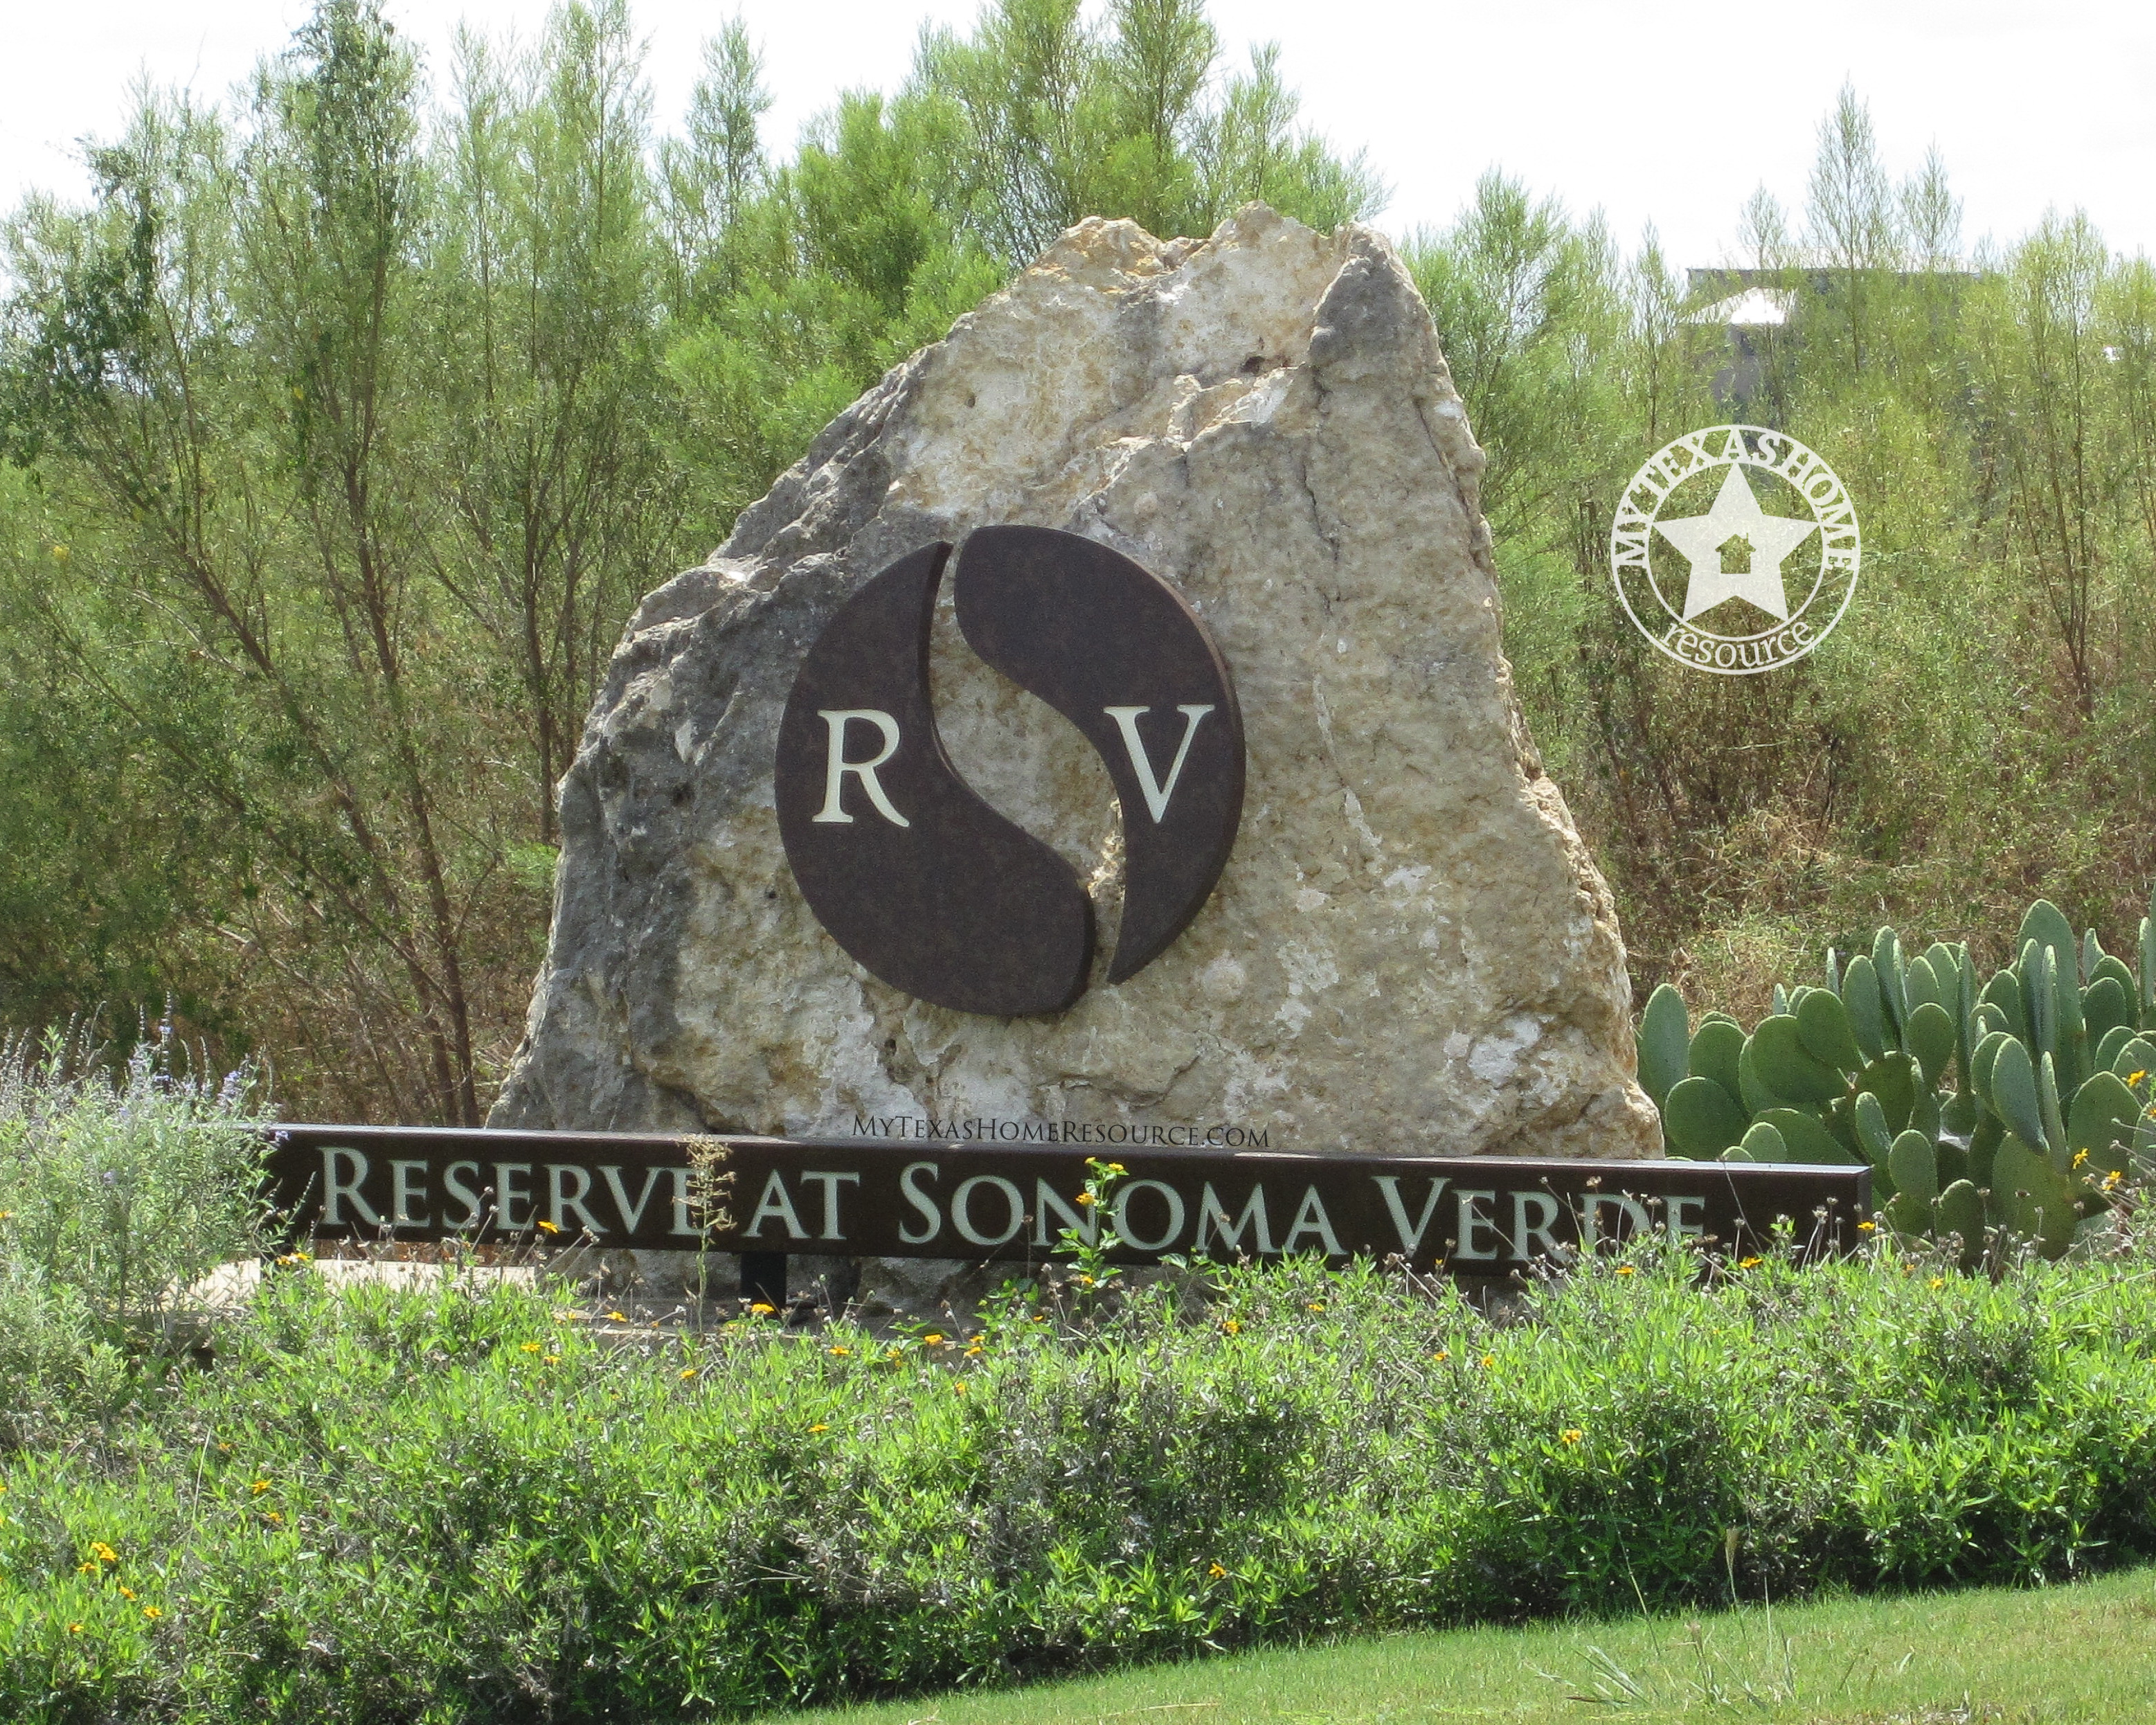 Reserve At Sonoma Verde